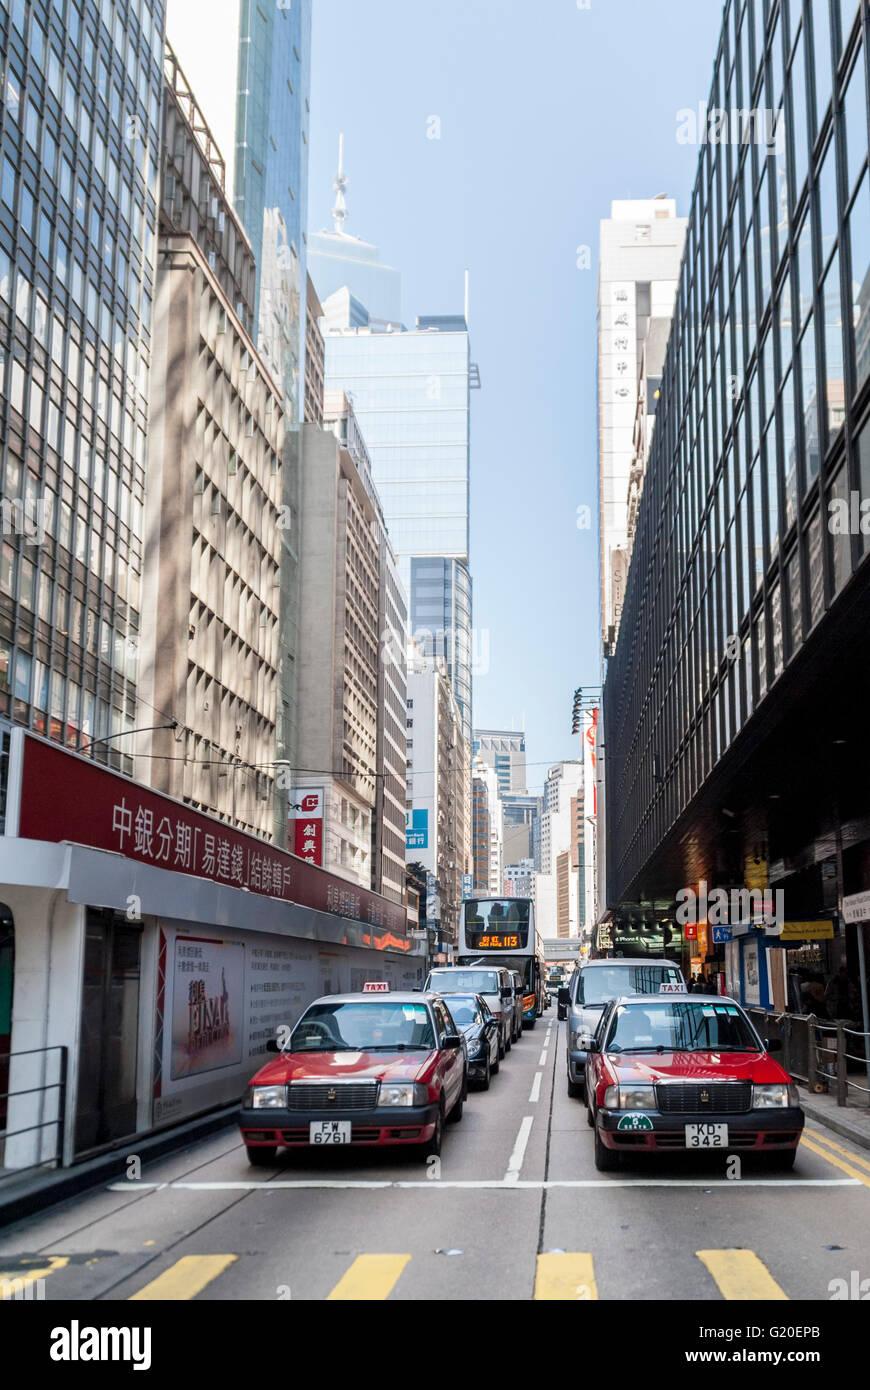 Hong Kong Red Light District Stock Photos & Hong Kong Red ...